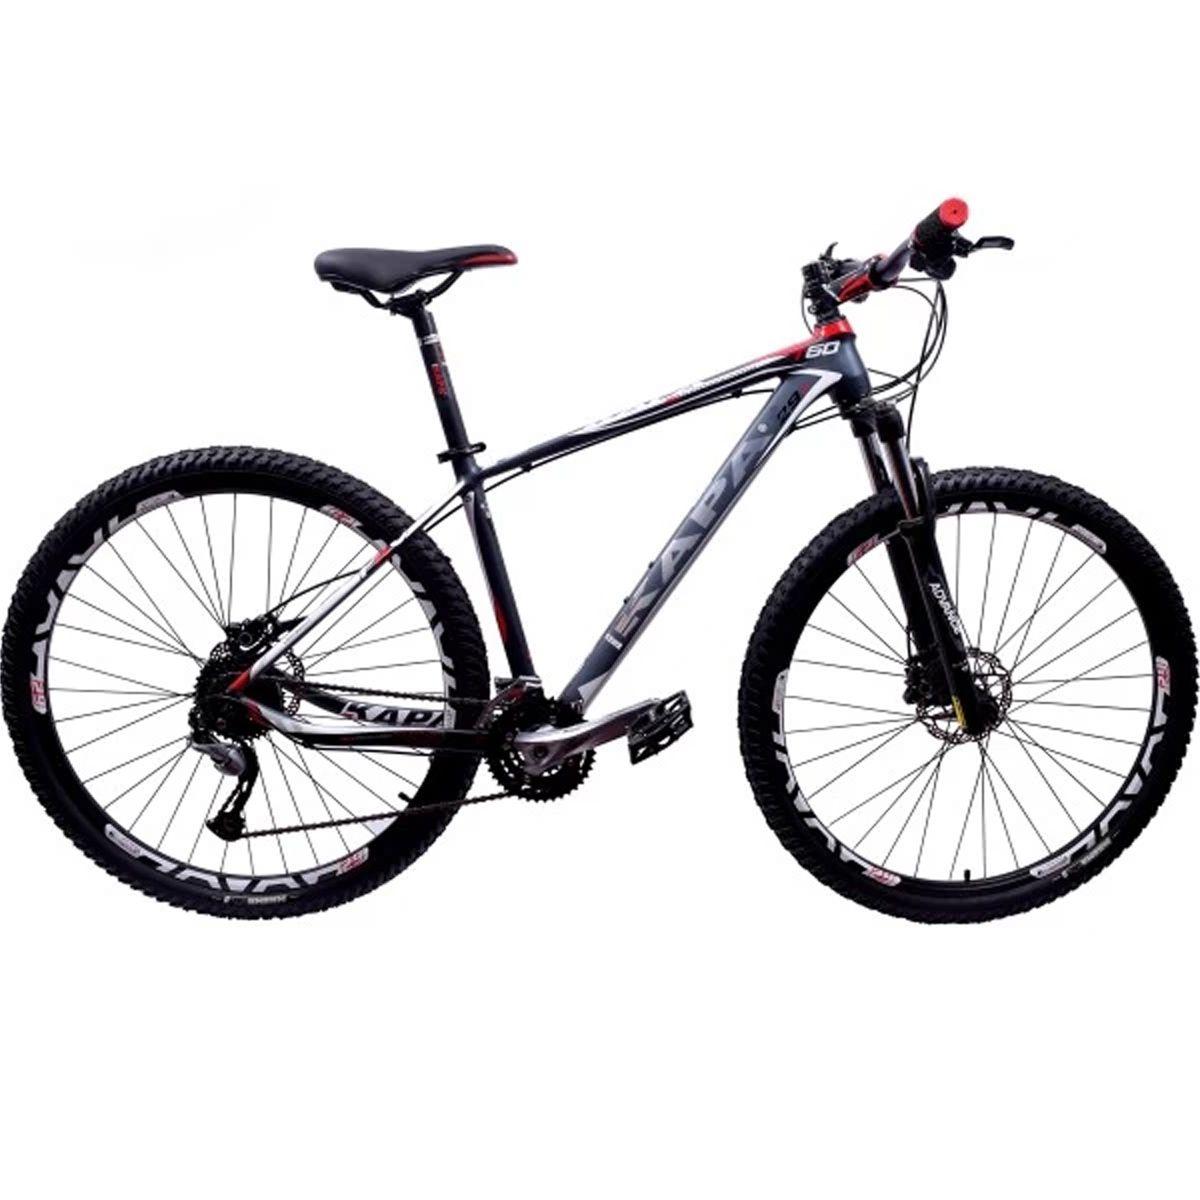 Bicicleta 29 Kapa T-60 Shimano Acera 27v Tamanho 17.5 Cinza